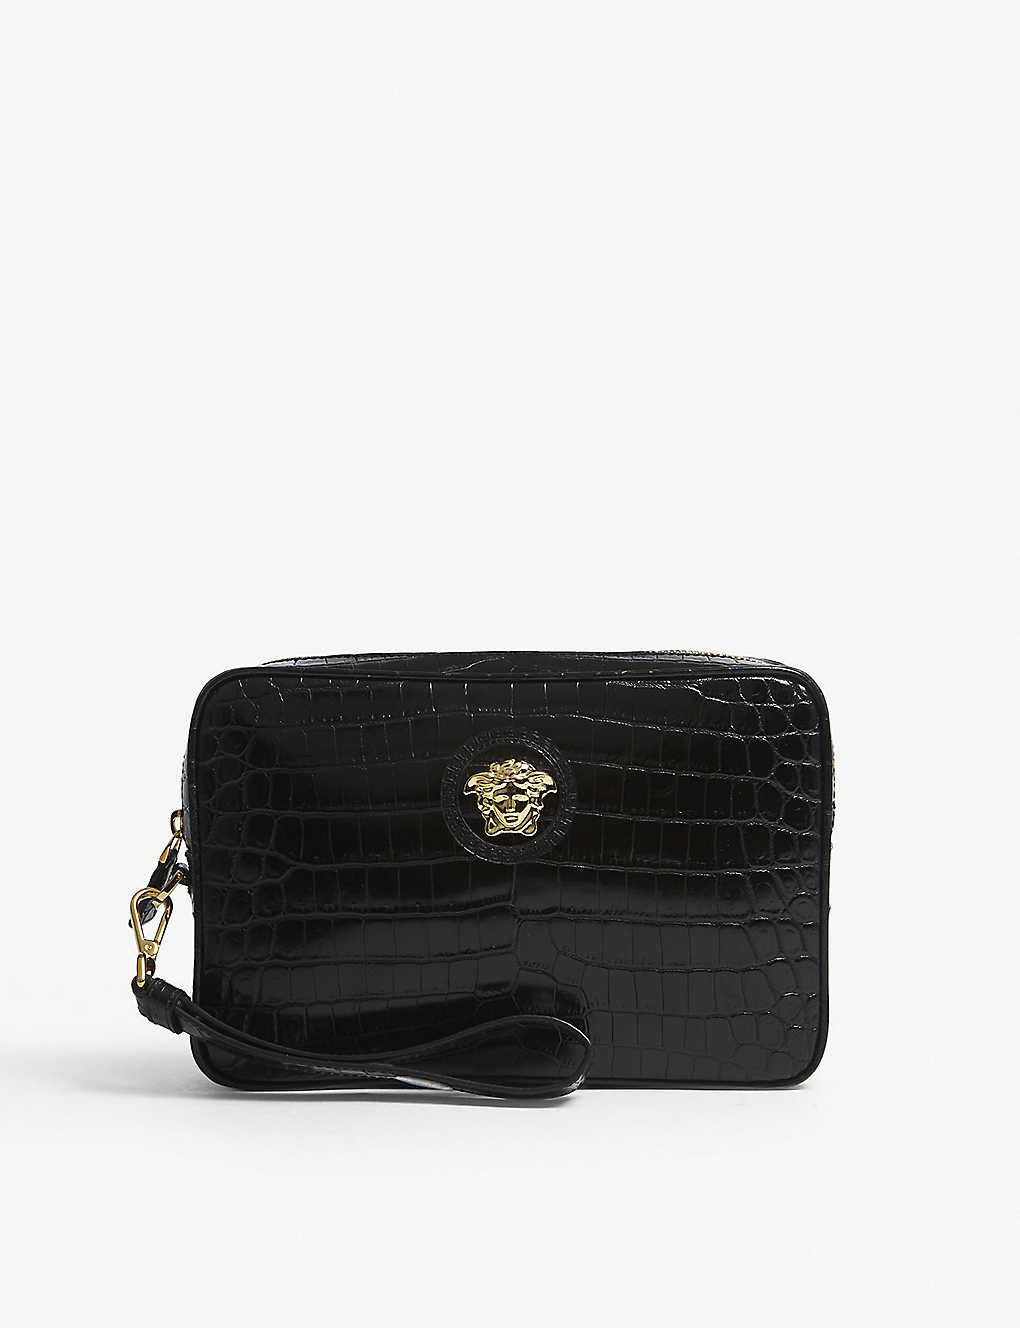 9521bcf3e6 VERSACE - Medusa crocodile-embossed leather clutch